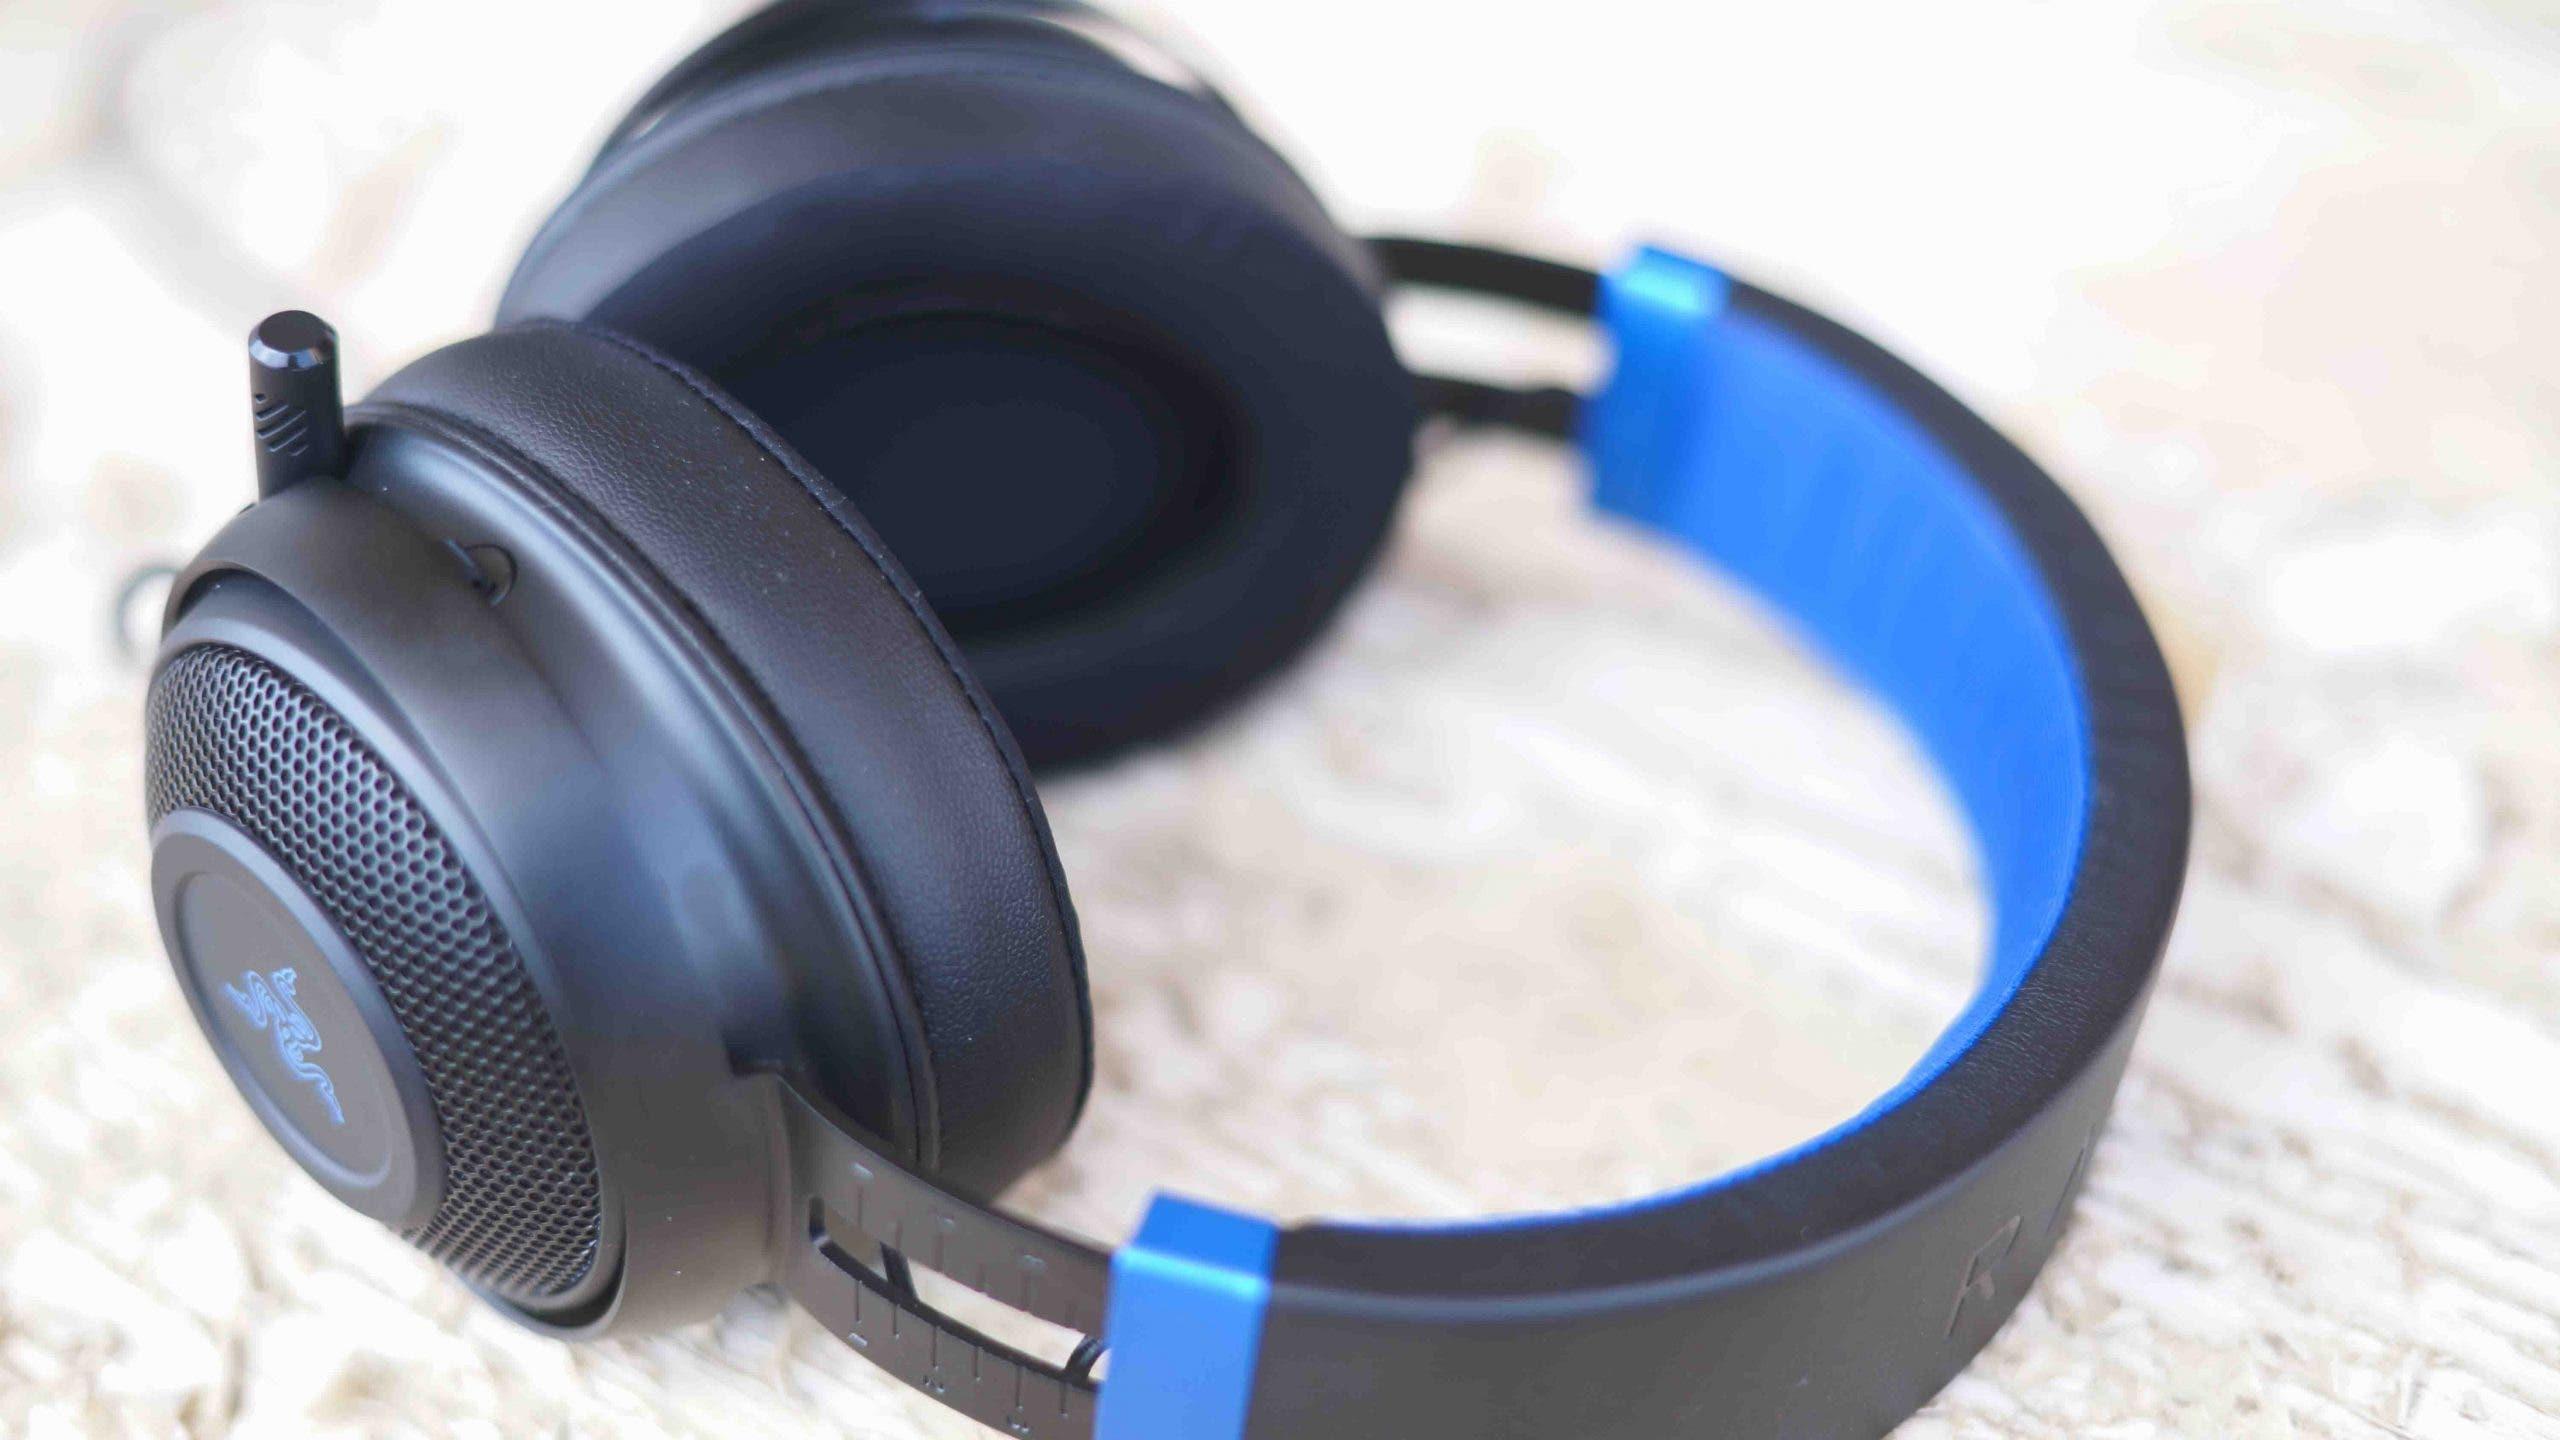 Análisis de los auriculares Razer Kraken for Console 1